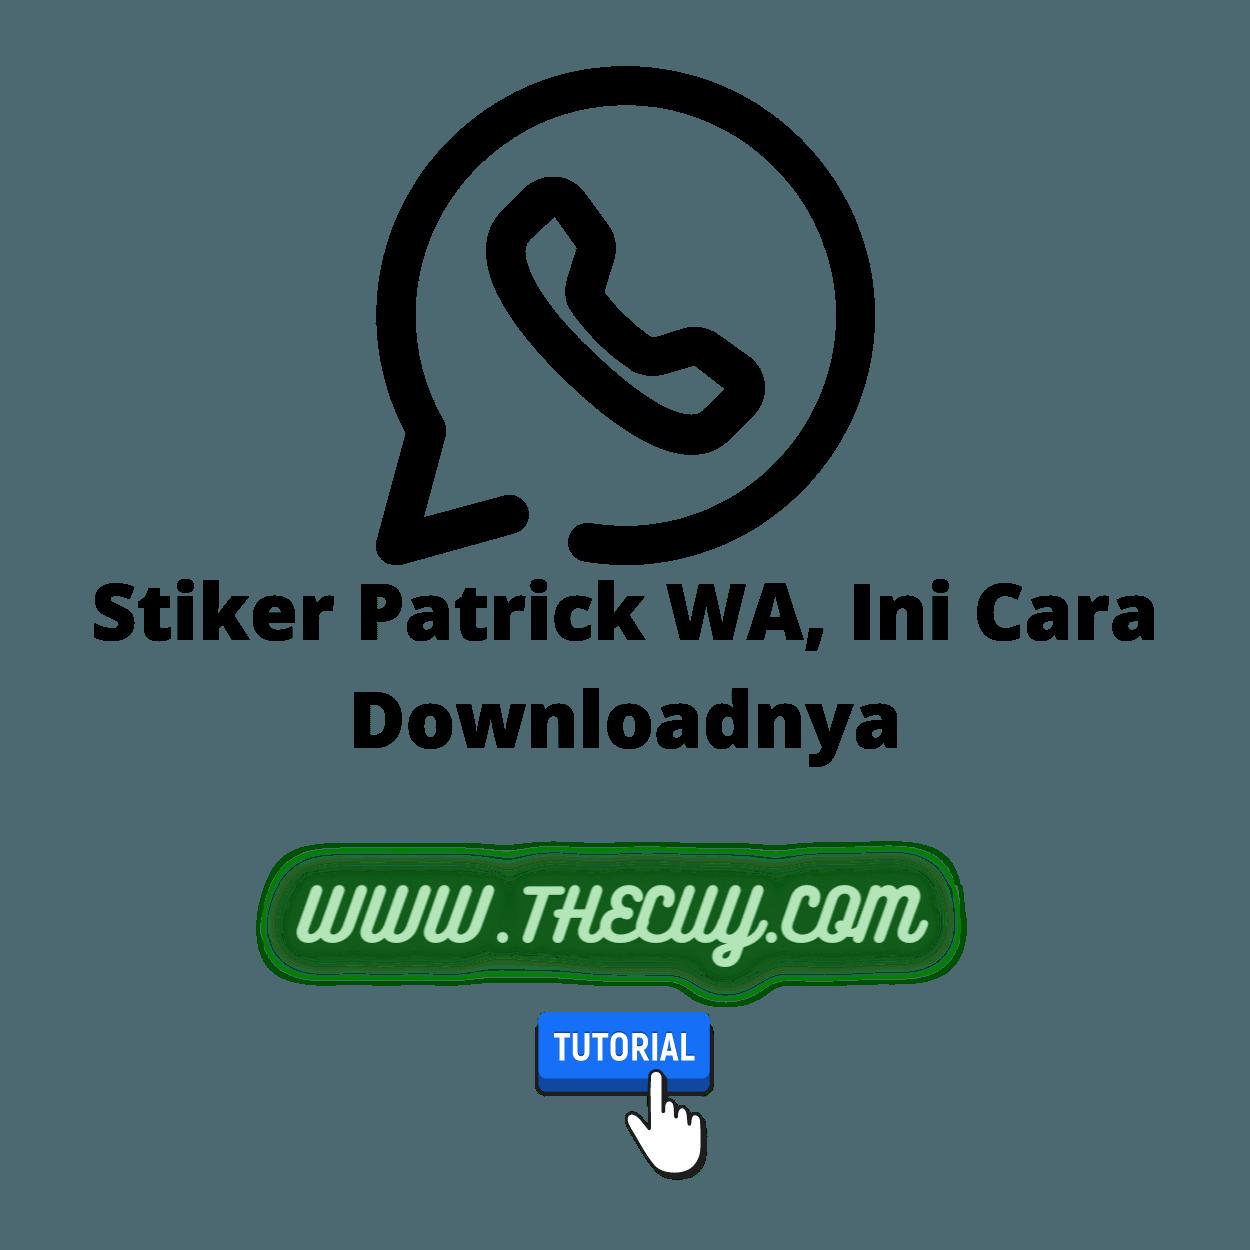 Stiker Patrick WA, Ini Cara Downloadnya